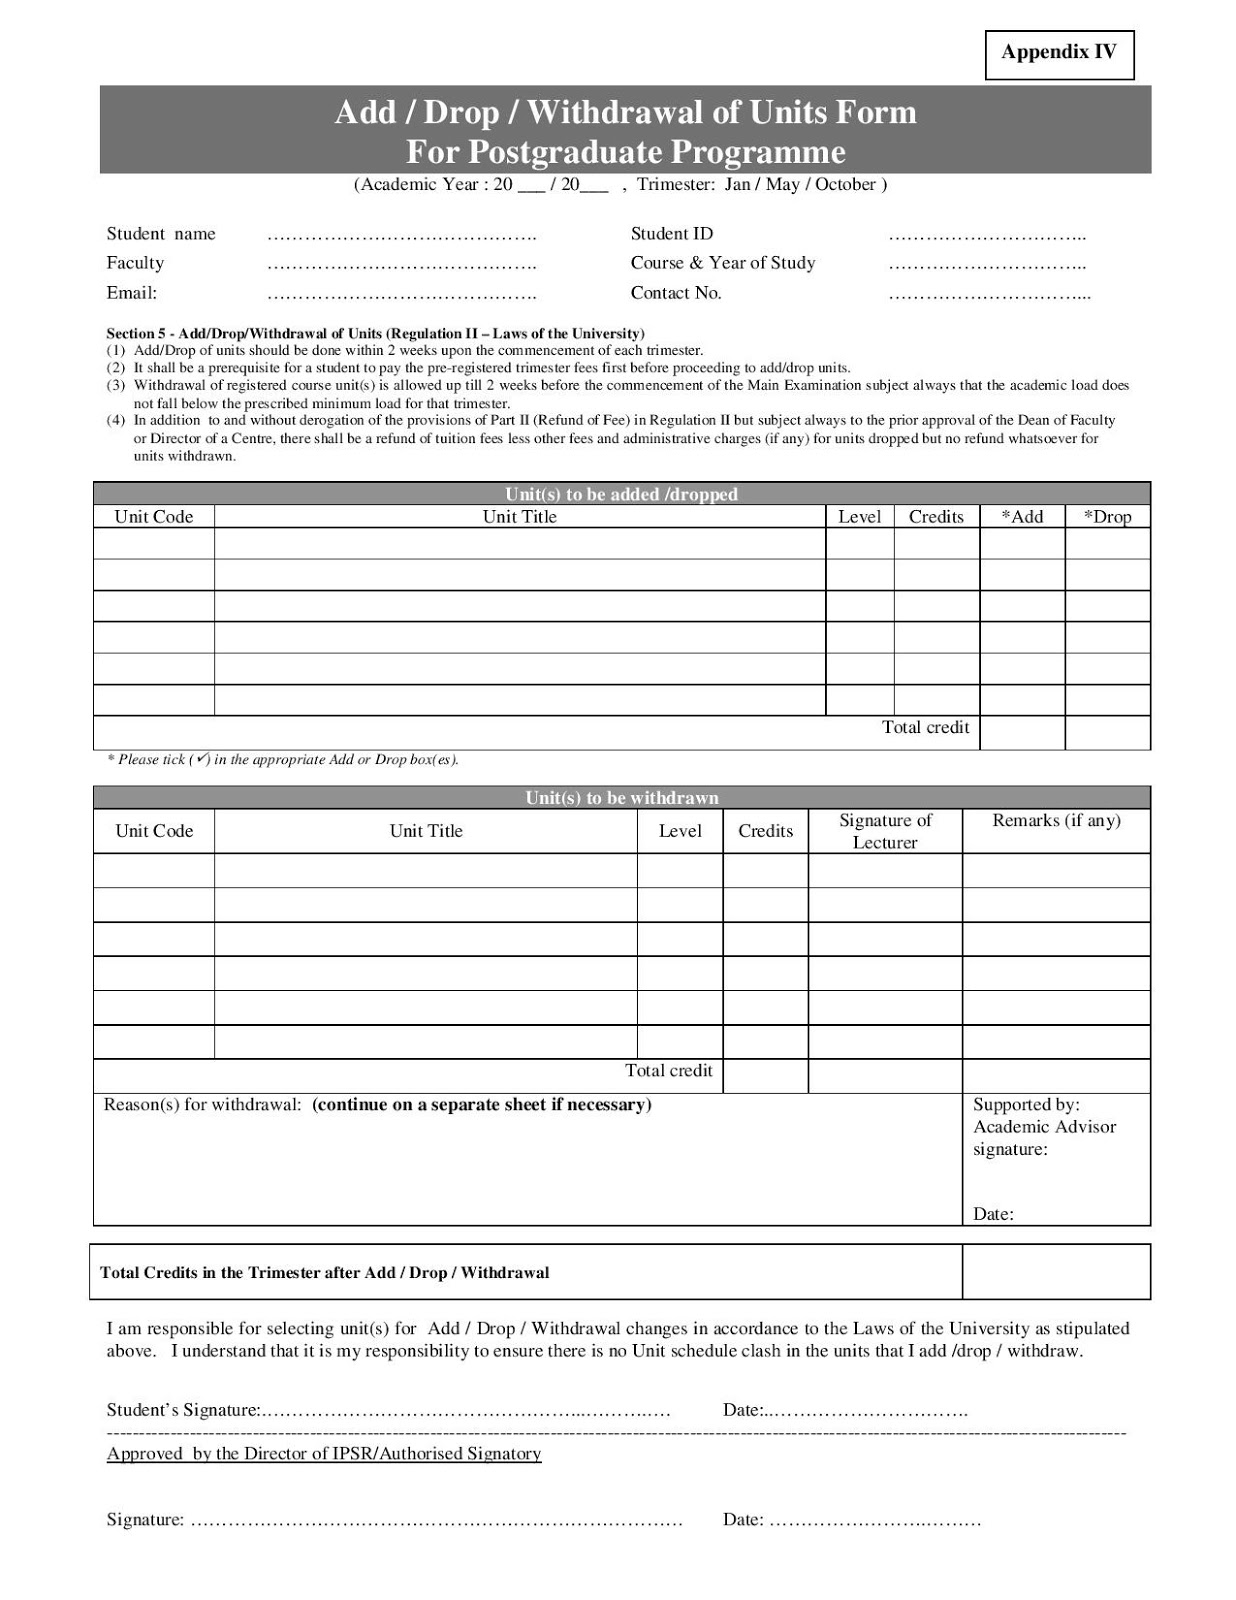 UTAR Part Time MBA Study Diary: April 2013